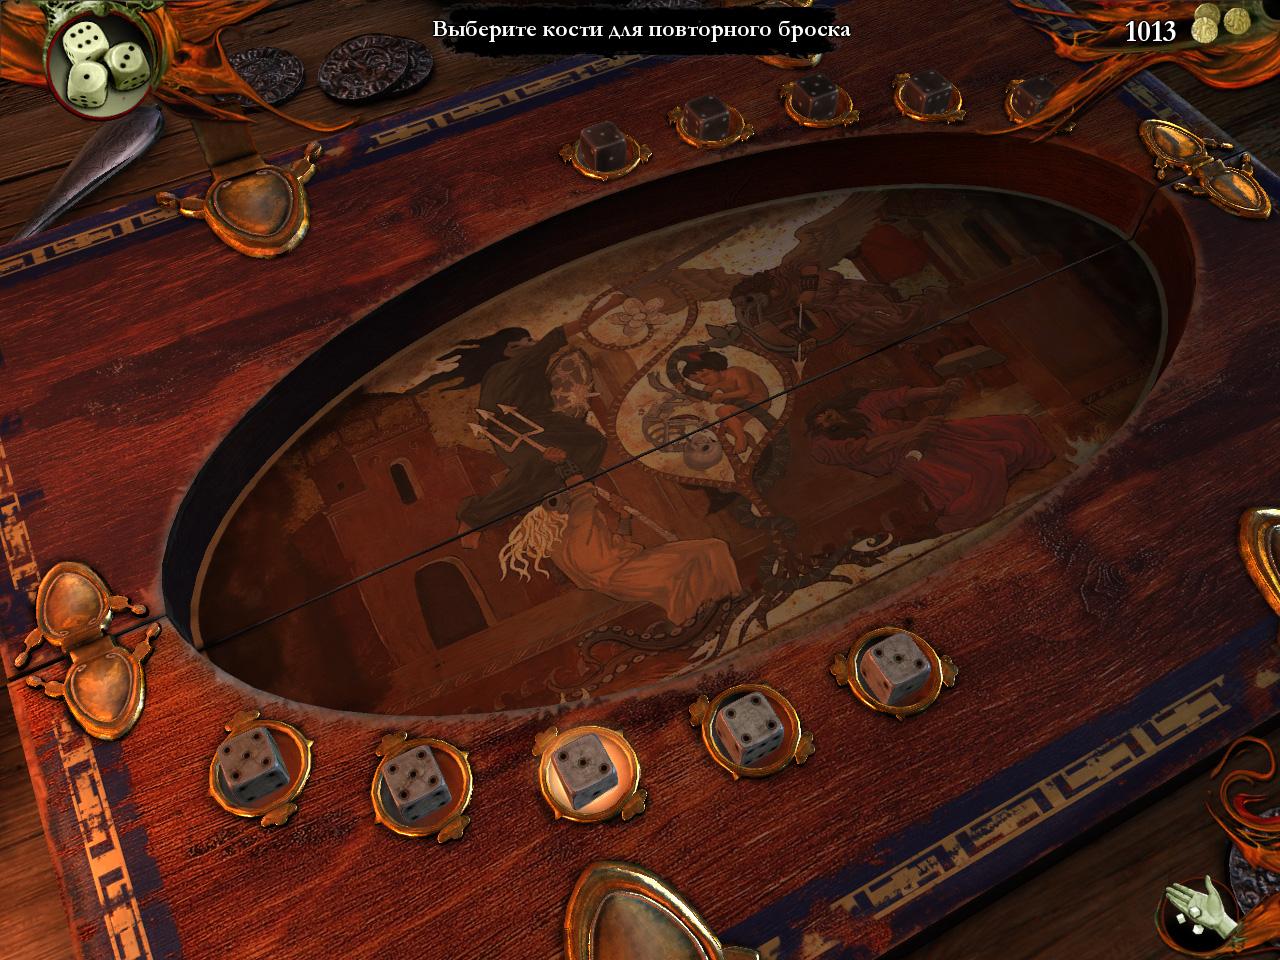 http://i.playground.ru/i/52/58/22/00/pix/image.jpg